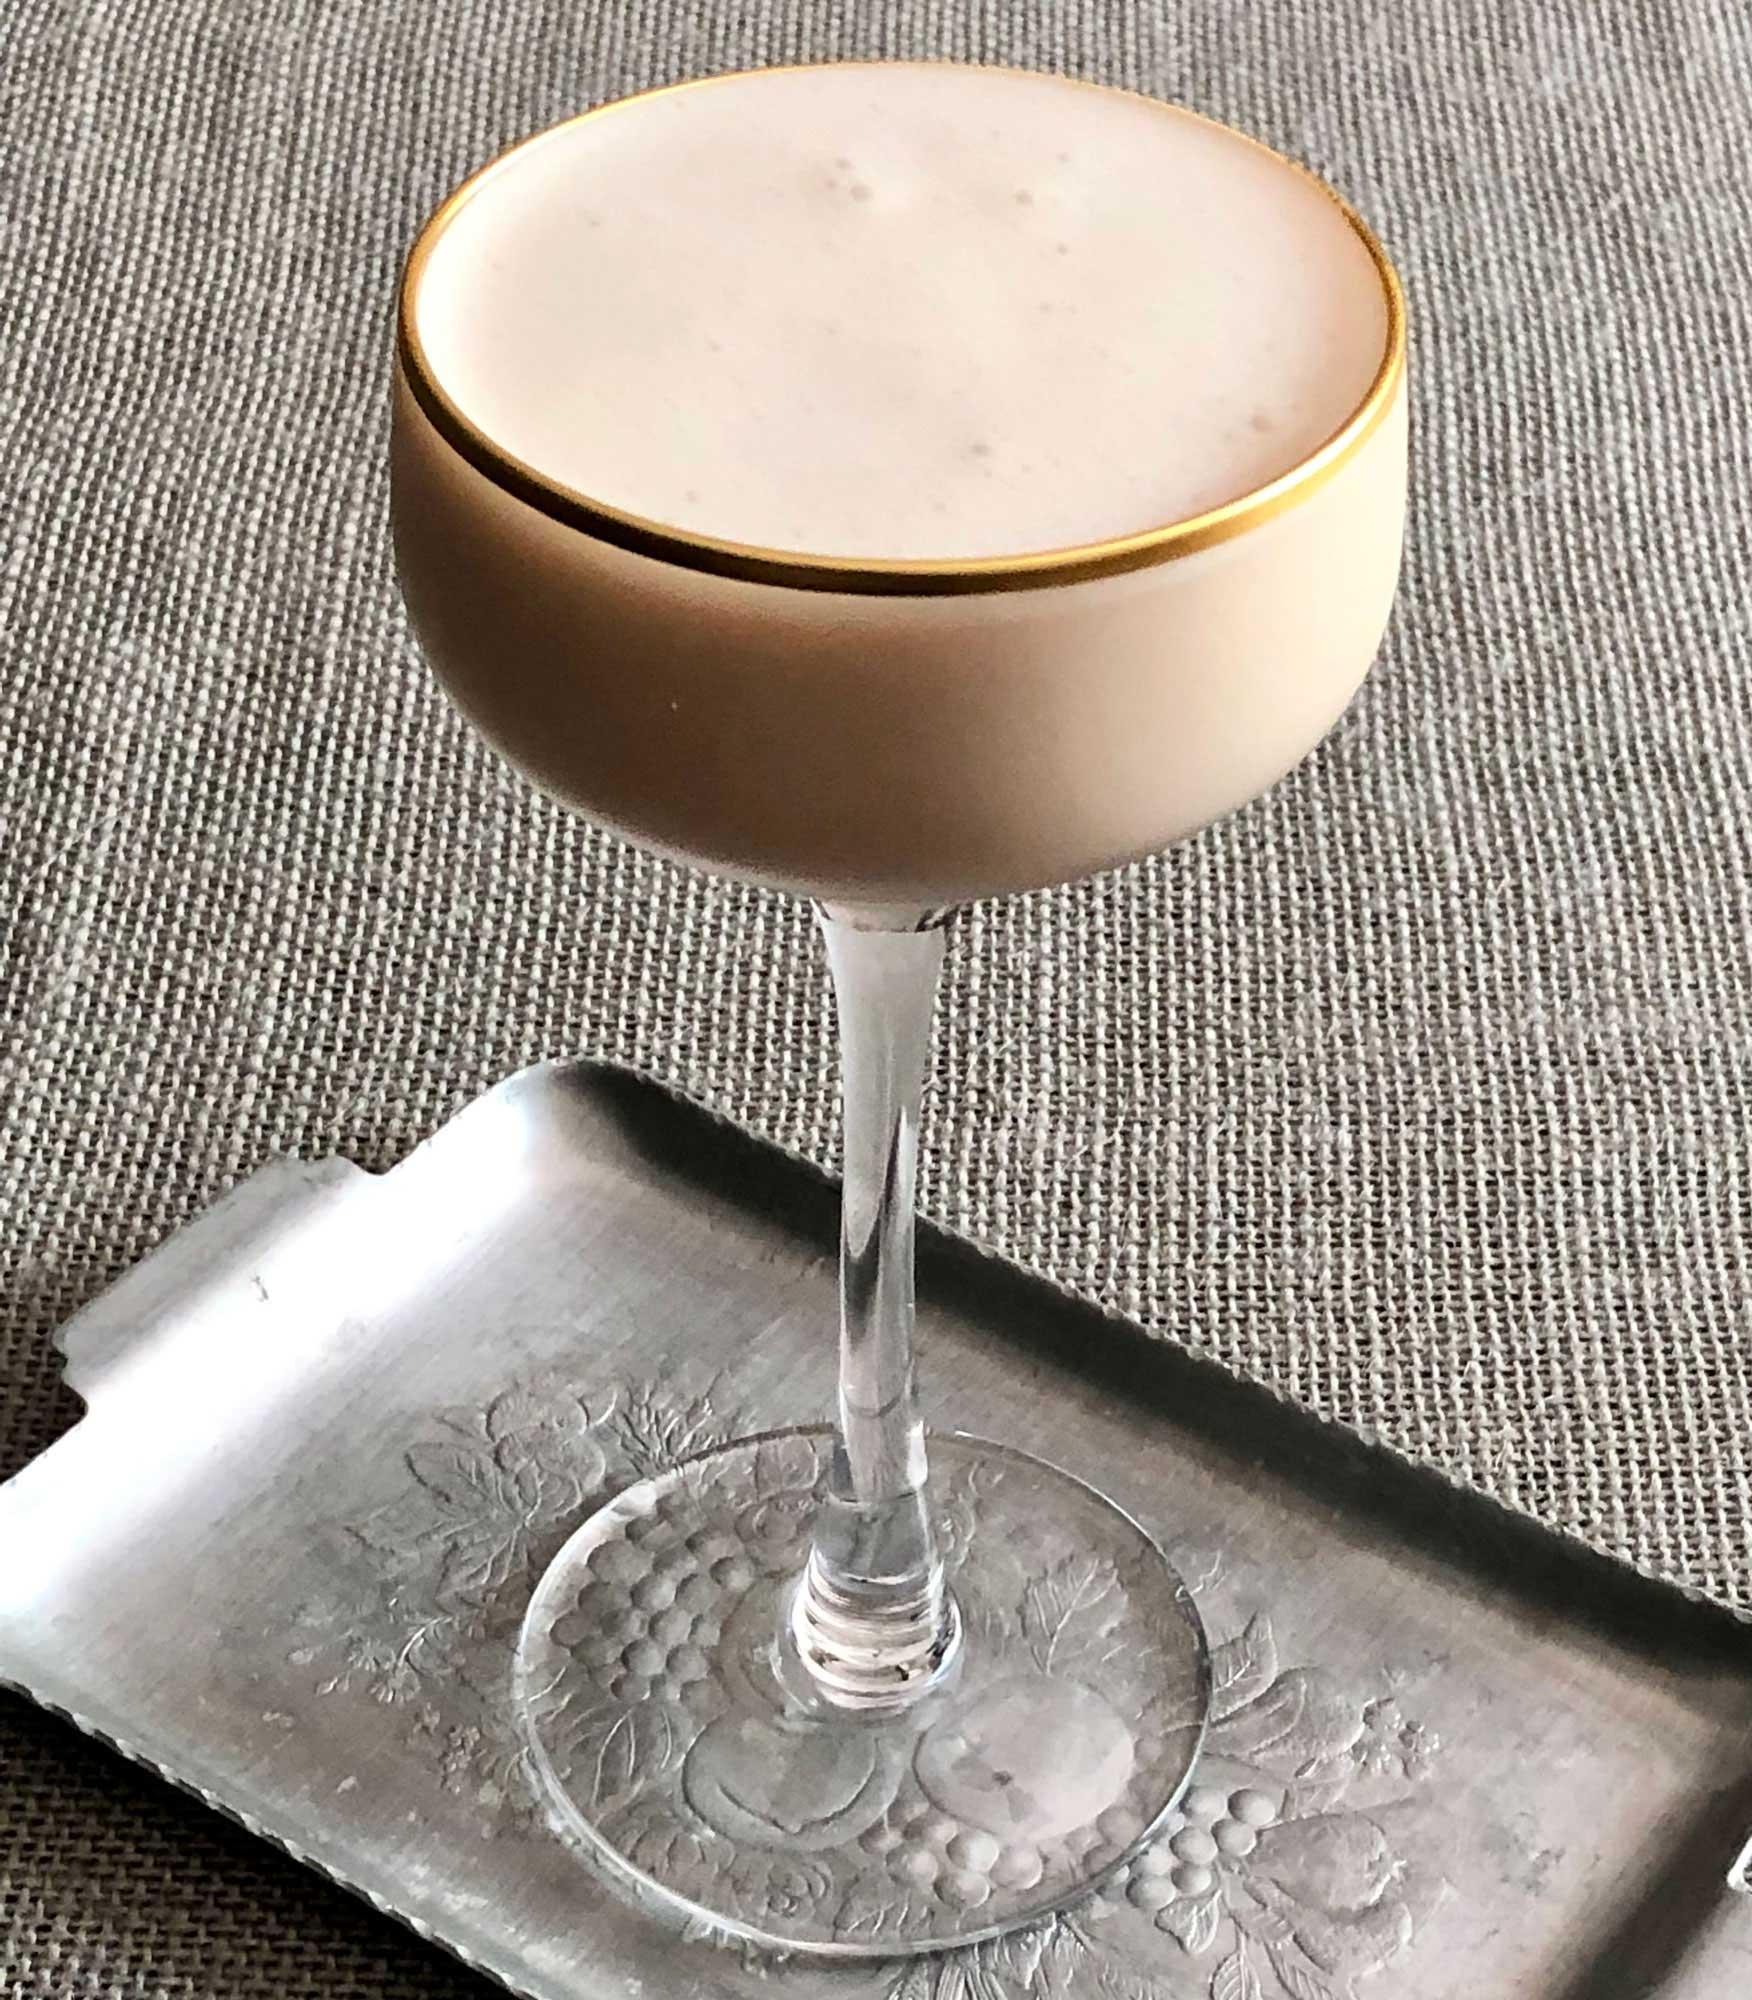 An example of the Juneau Suisse, the mixed drink (cocktail) featuring Purkhart Pear Williams Eau-de-Vie, cream, Dolin Génépy le Chamois Liqueur, Nux Alpina Walnut Liqueur, Angostura bitters, and crème de cacao (white); photo by Lee Edwards